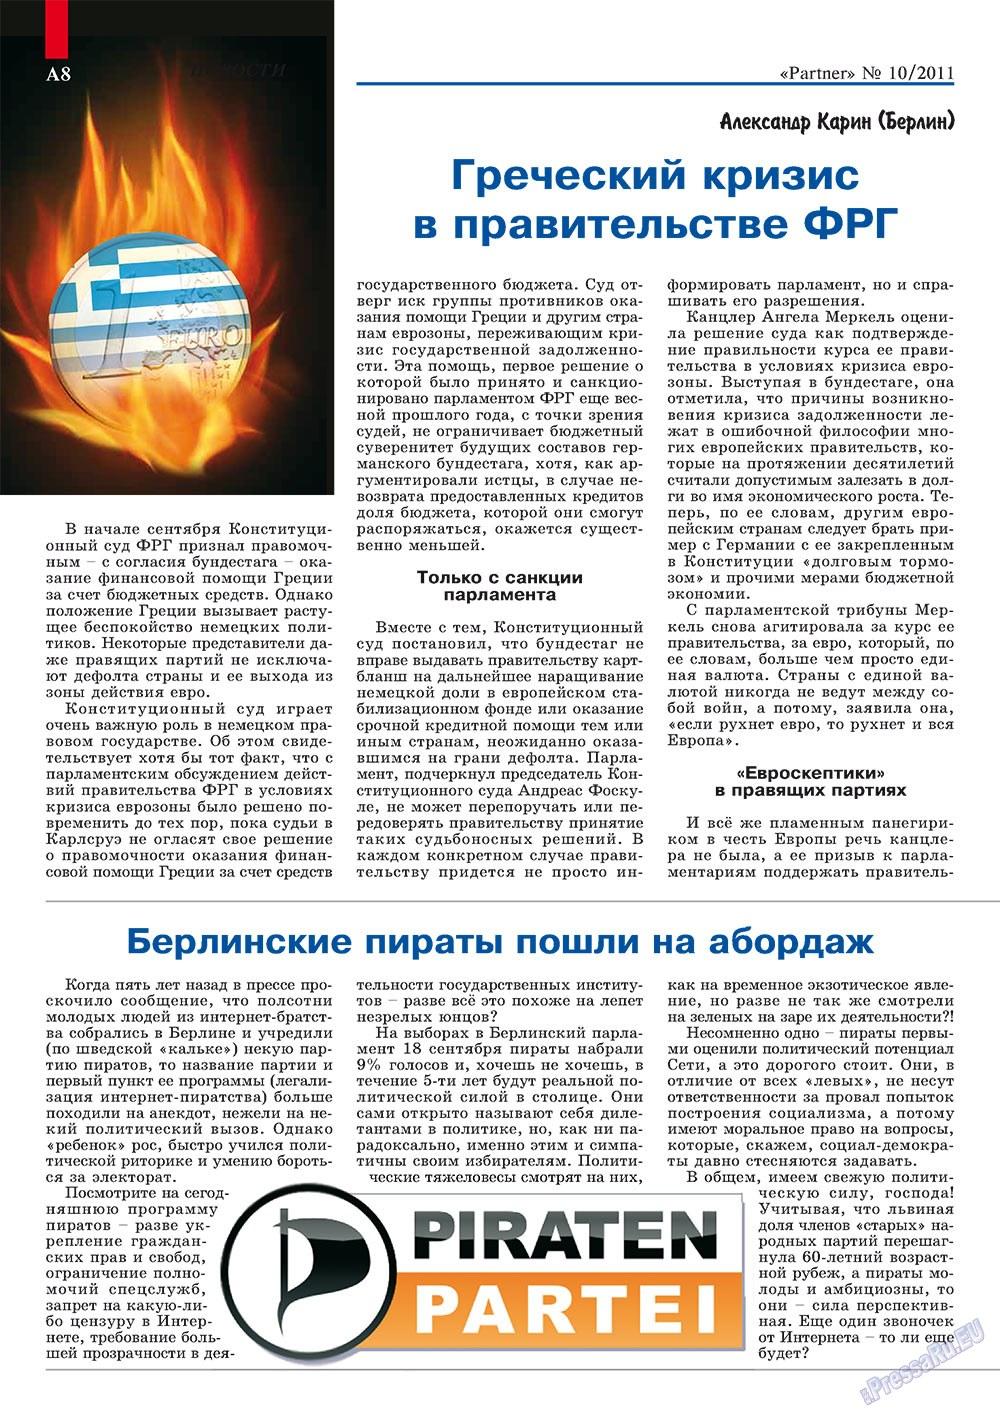 Партнер-север (журнал). 2011 год, номер 10, стр. 8